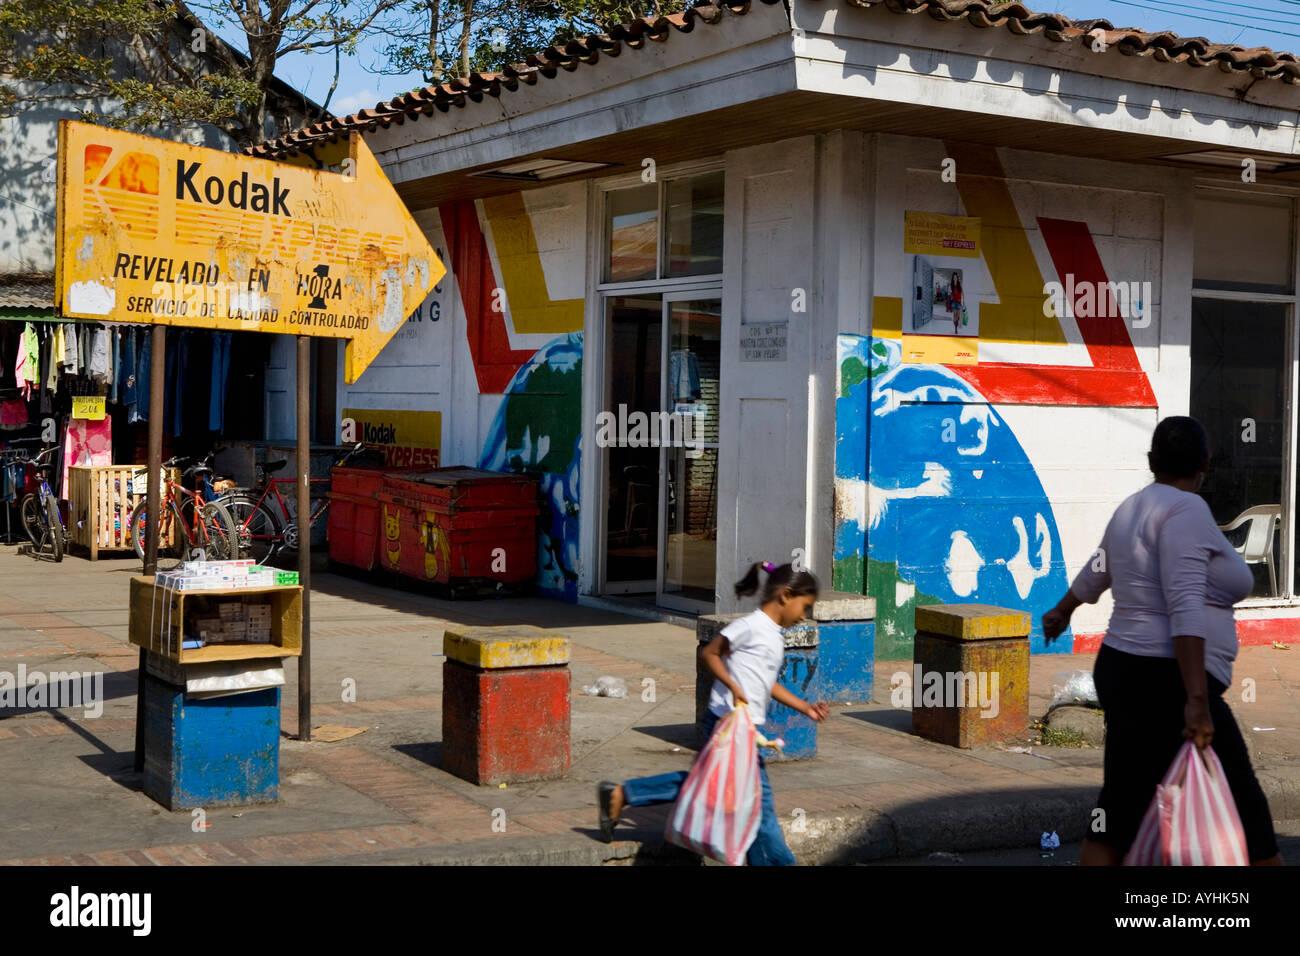 Kodak Moment Stock Photos & Kodak Moment Stock Images - Alamy